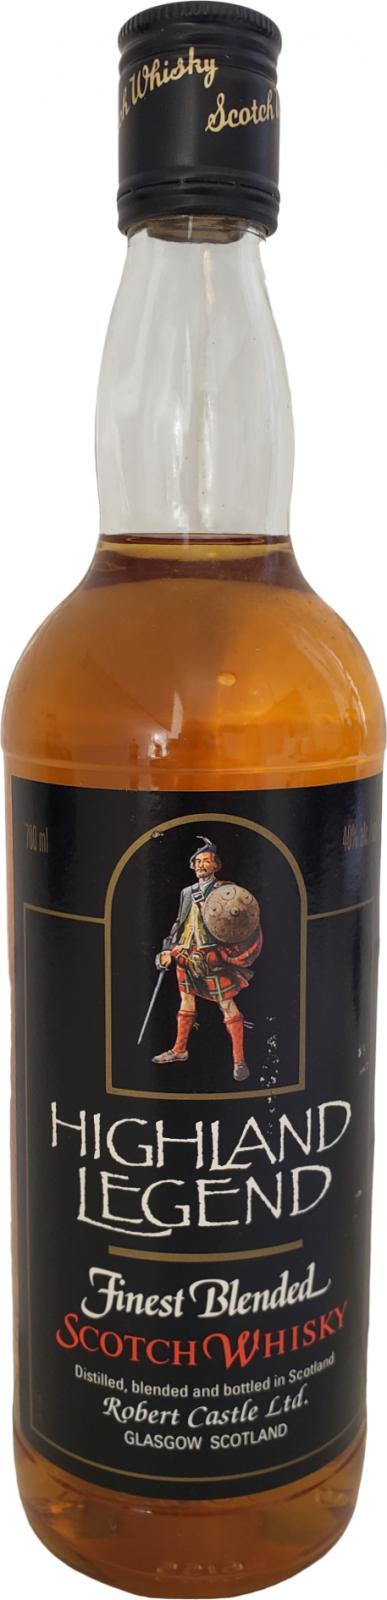 Highland Legend Finest Blended Scotch Whisky